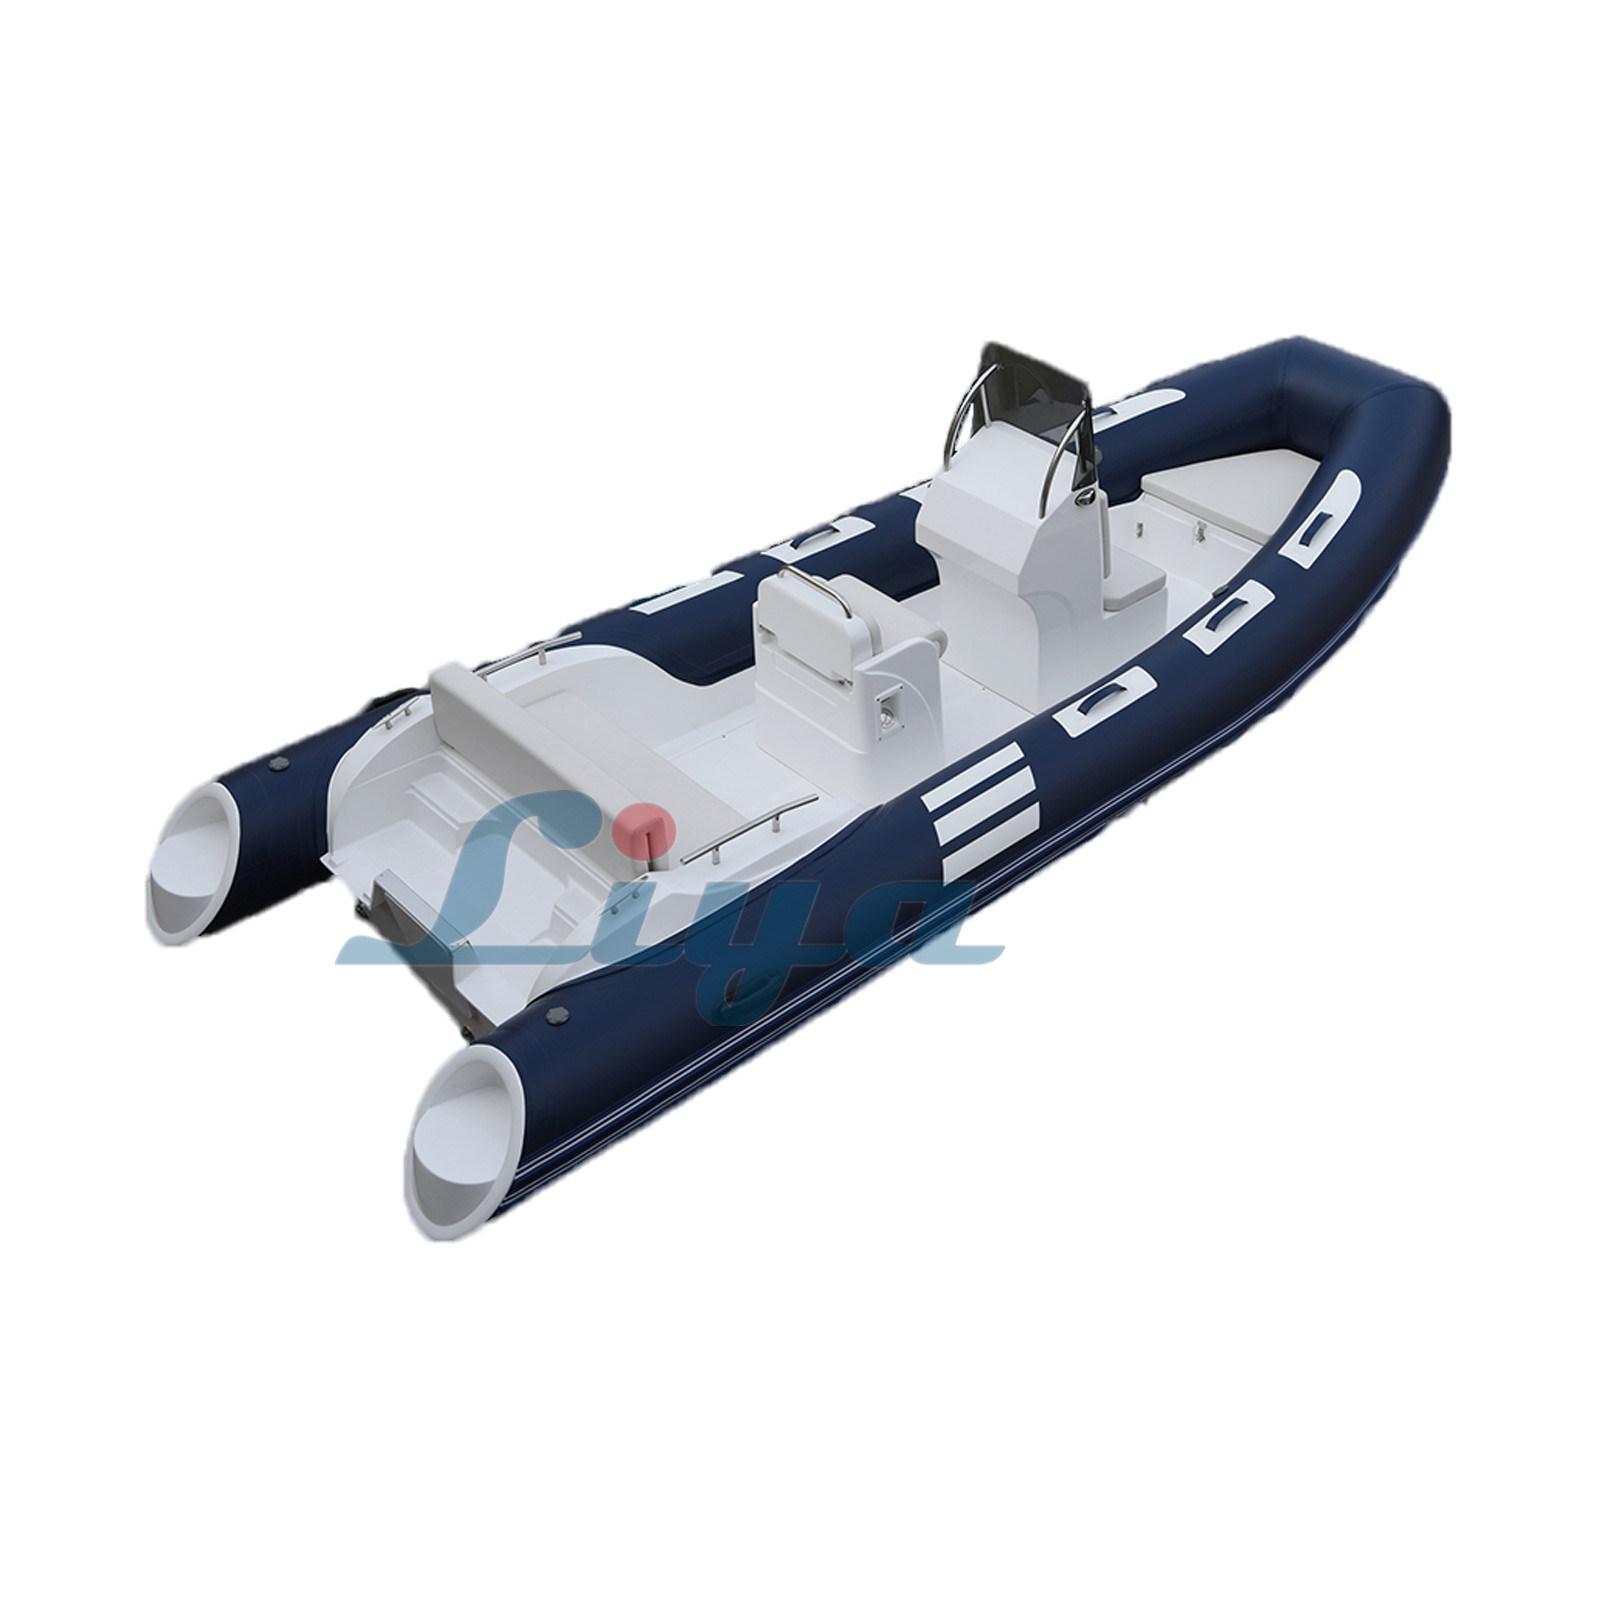 b3dd81edfd3 China Liya Rib Boat Rigid Inflatable Boat PVC and Hypalon 5.2m ...